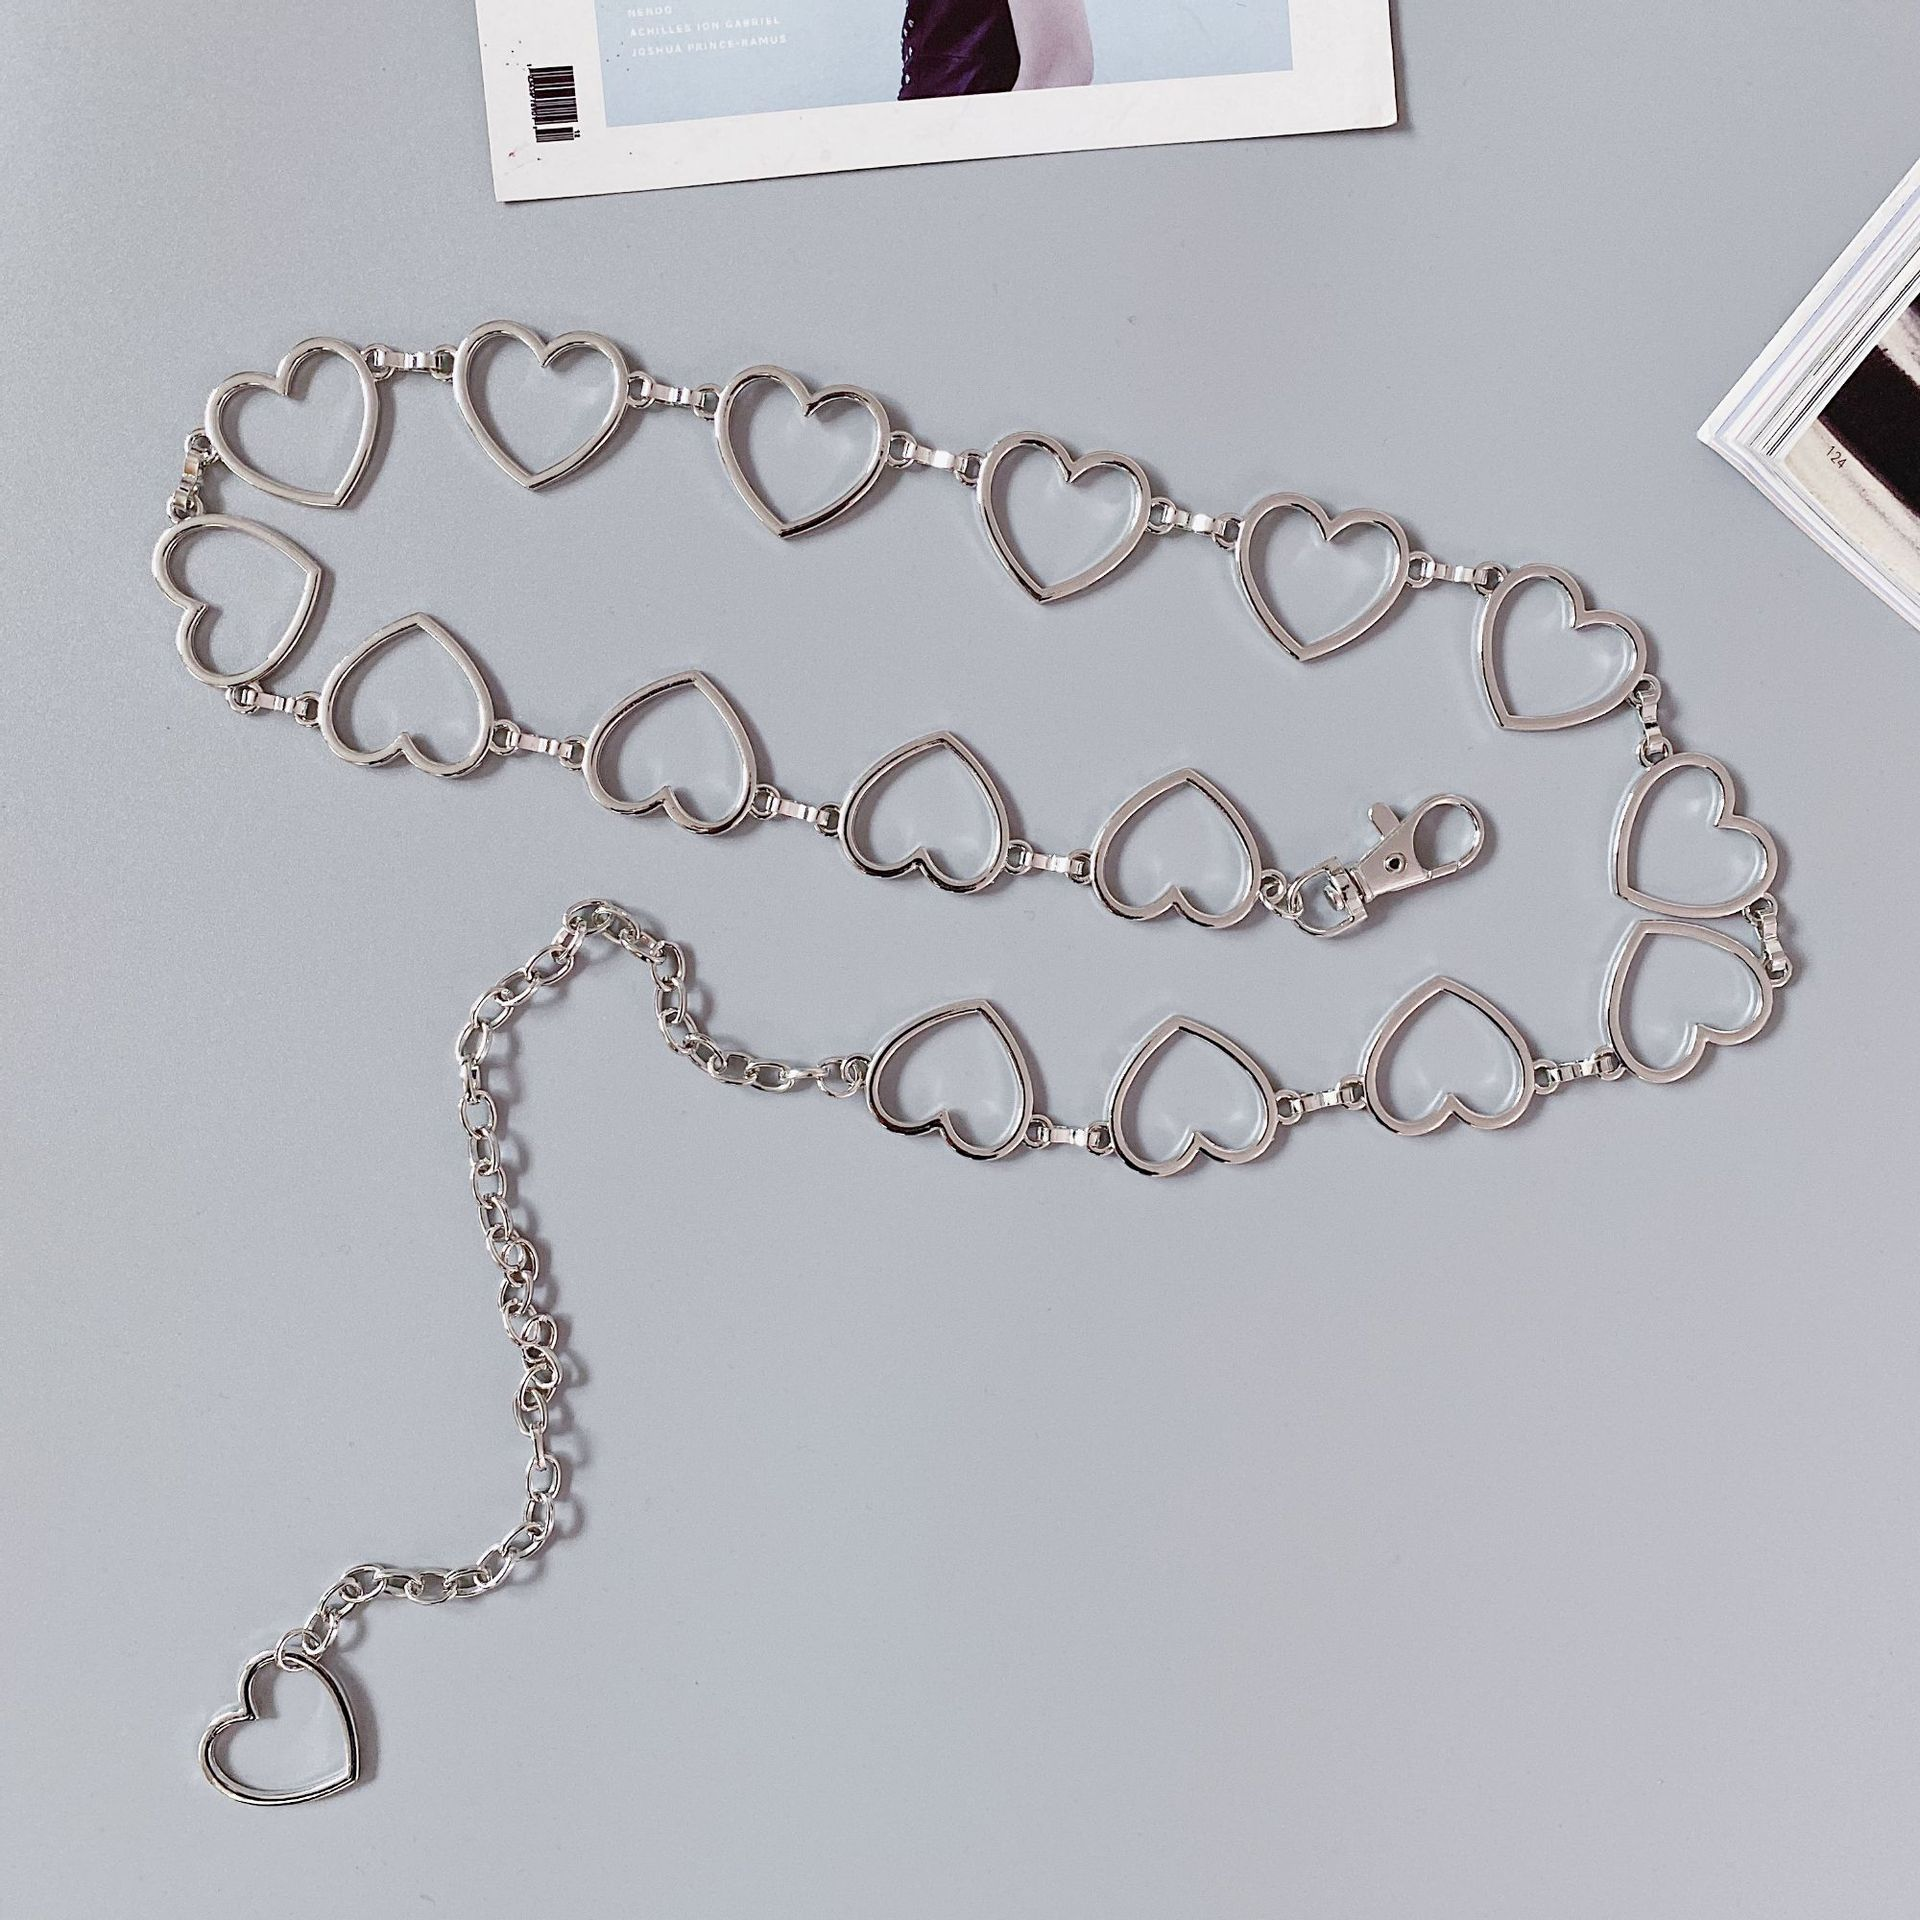 92bdd0cc-be3b-48b1-97d6-e75eeda369f4 Heart Shaped Belt Chain Women Fashion Circle Metal Waist Chain